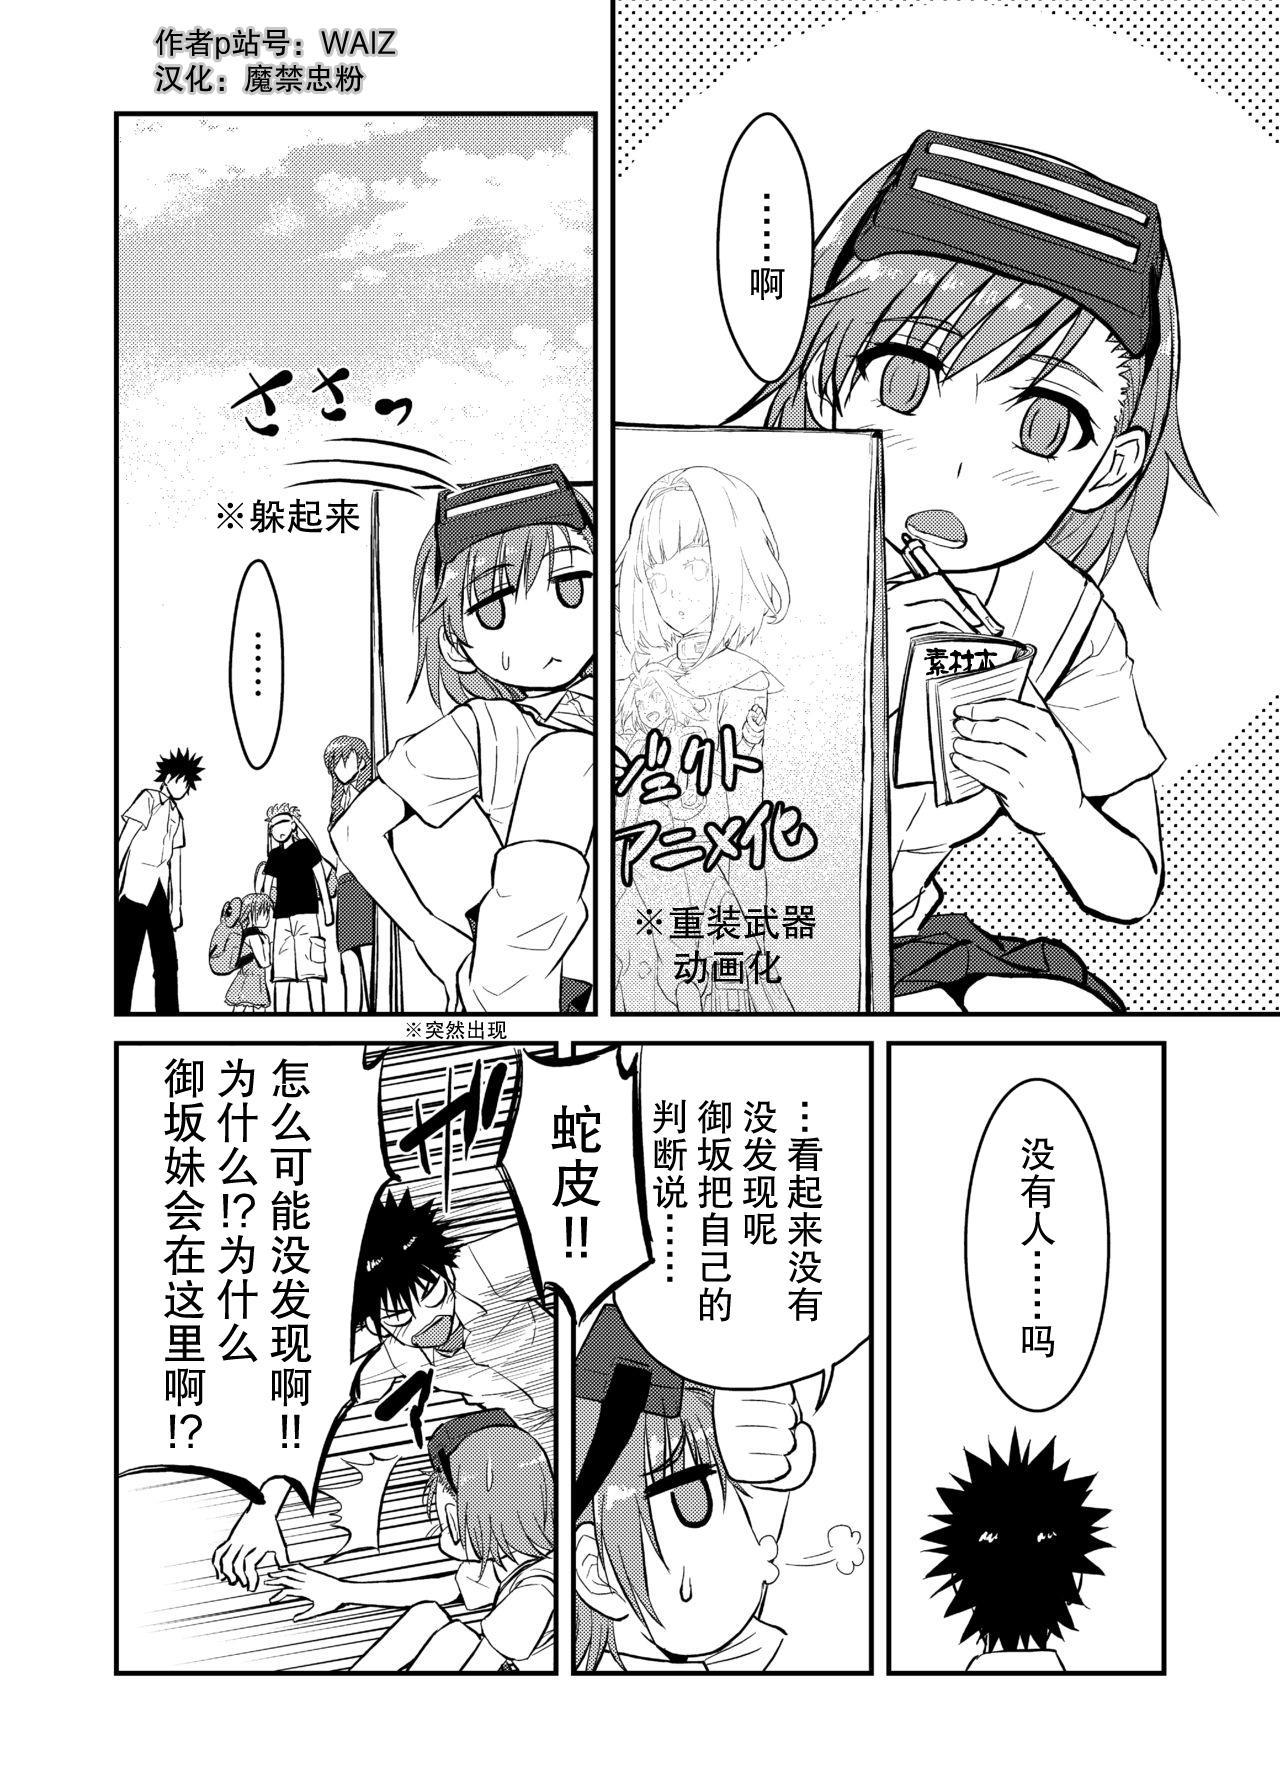 [WAIZ][同人个人渣汉化][就算是上条先生我家要住7个人还是太勉强了](Toaru Majutsu no Index) [中国翻译] 24